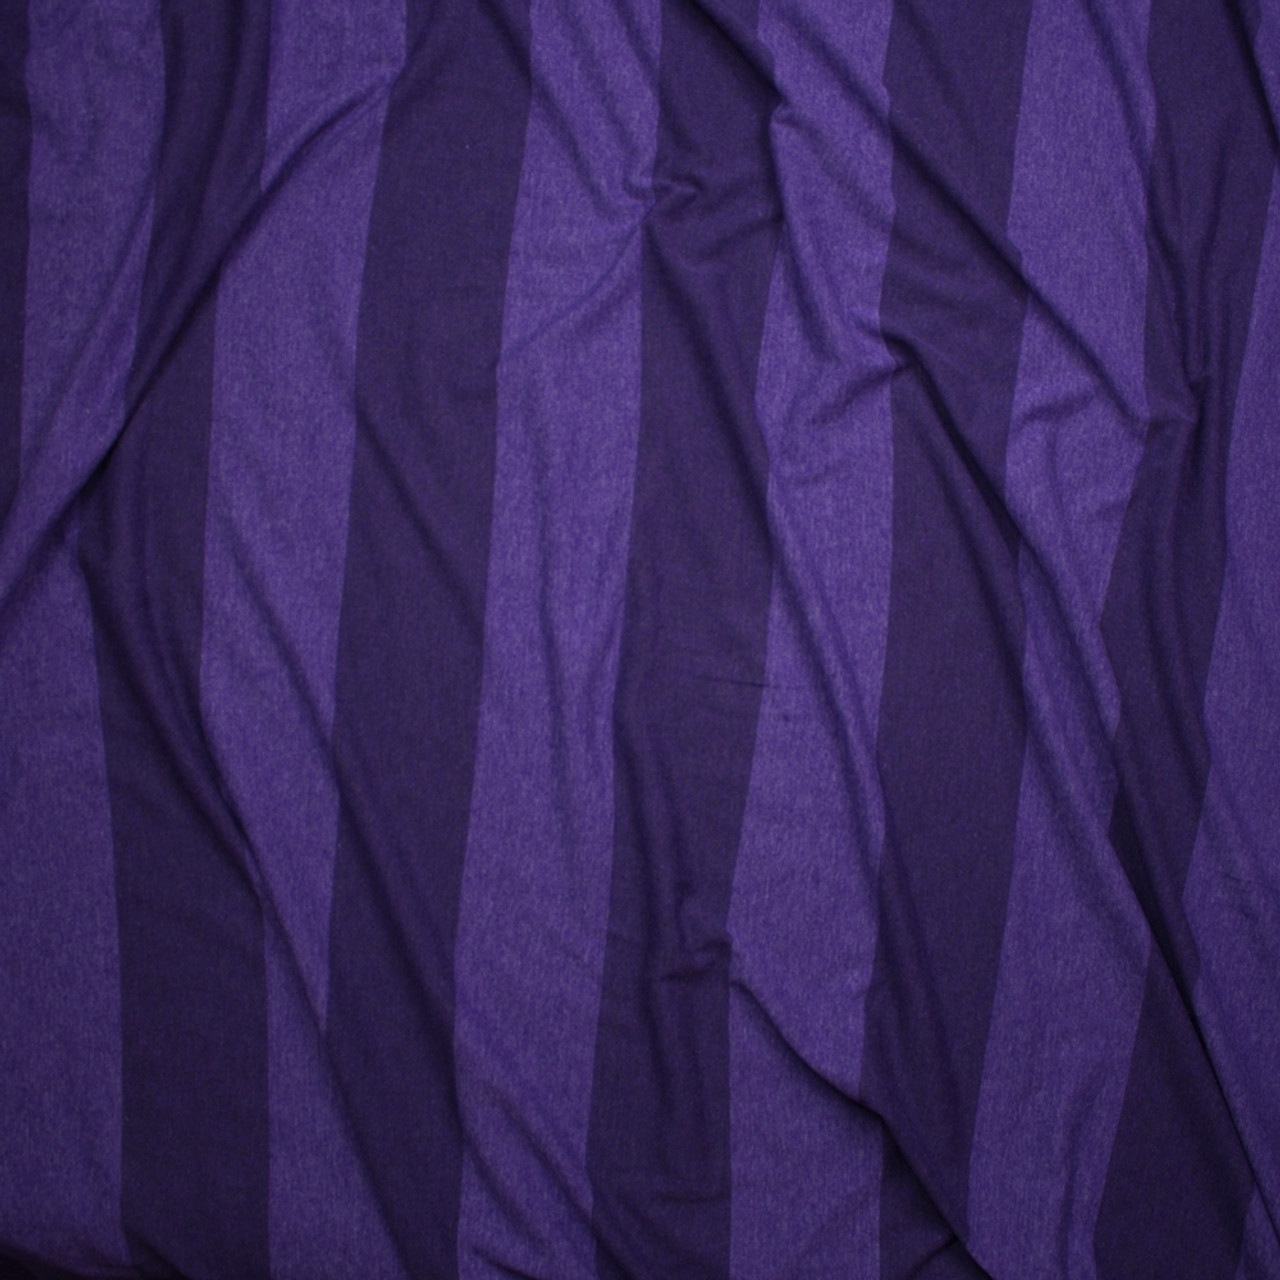 c730b41d1a6 ... Purple Wide Stripe Lightweight Jersey Knit Fabric By The Yard - Wide  shot